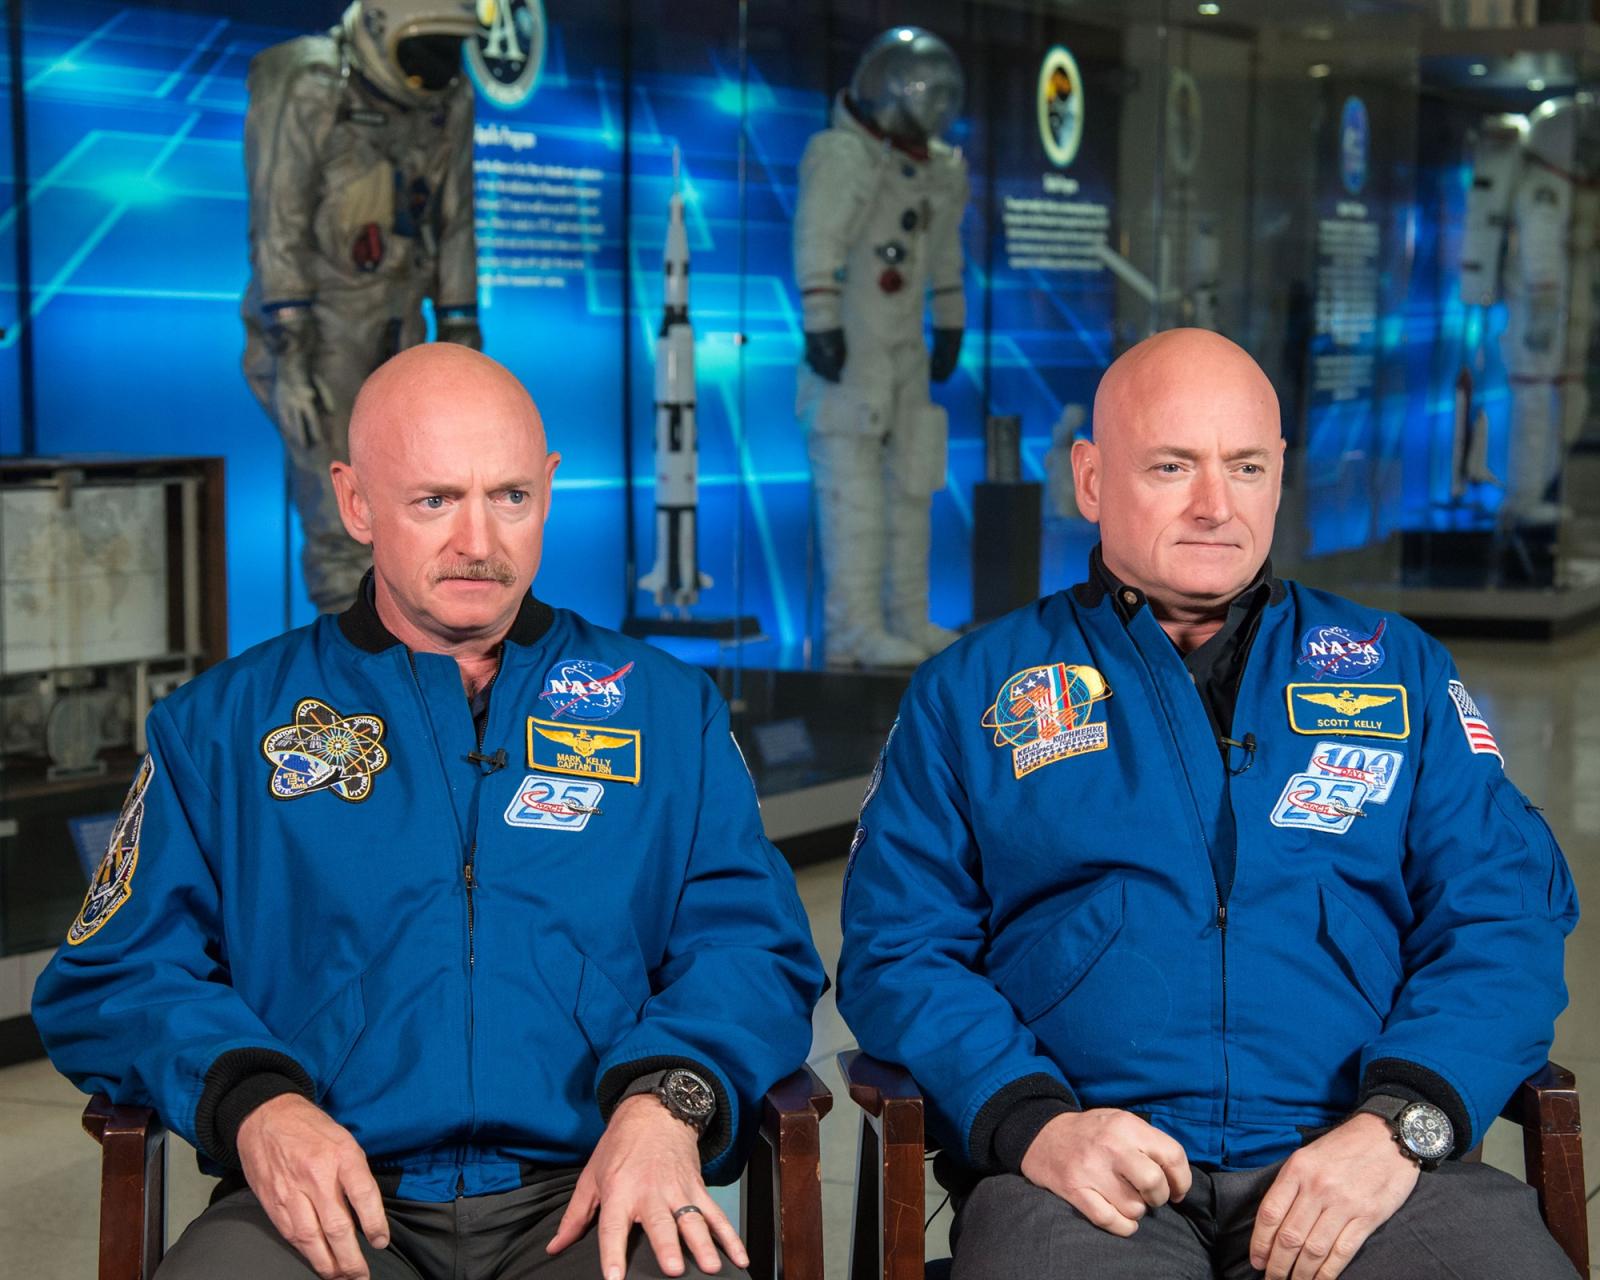 Els astronautes Scott i Mark Kelly, bessons idèntics